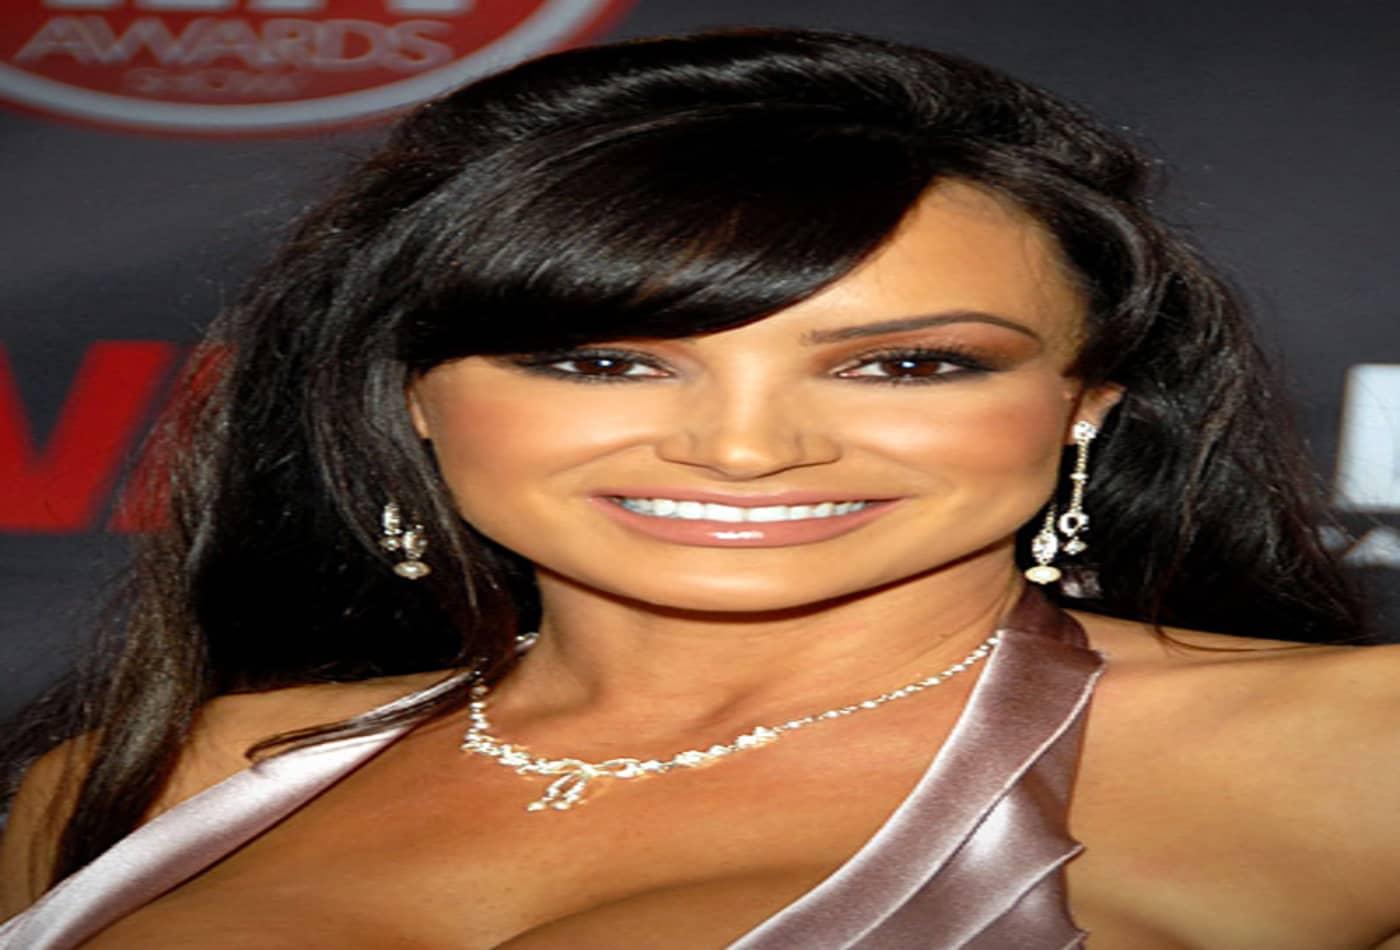 The Dirty Dozen 2012 Porns Most Popular Stars-7095